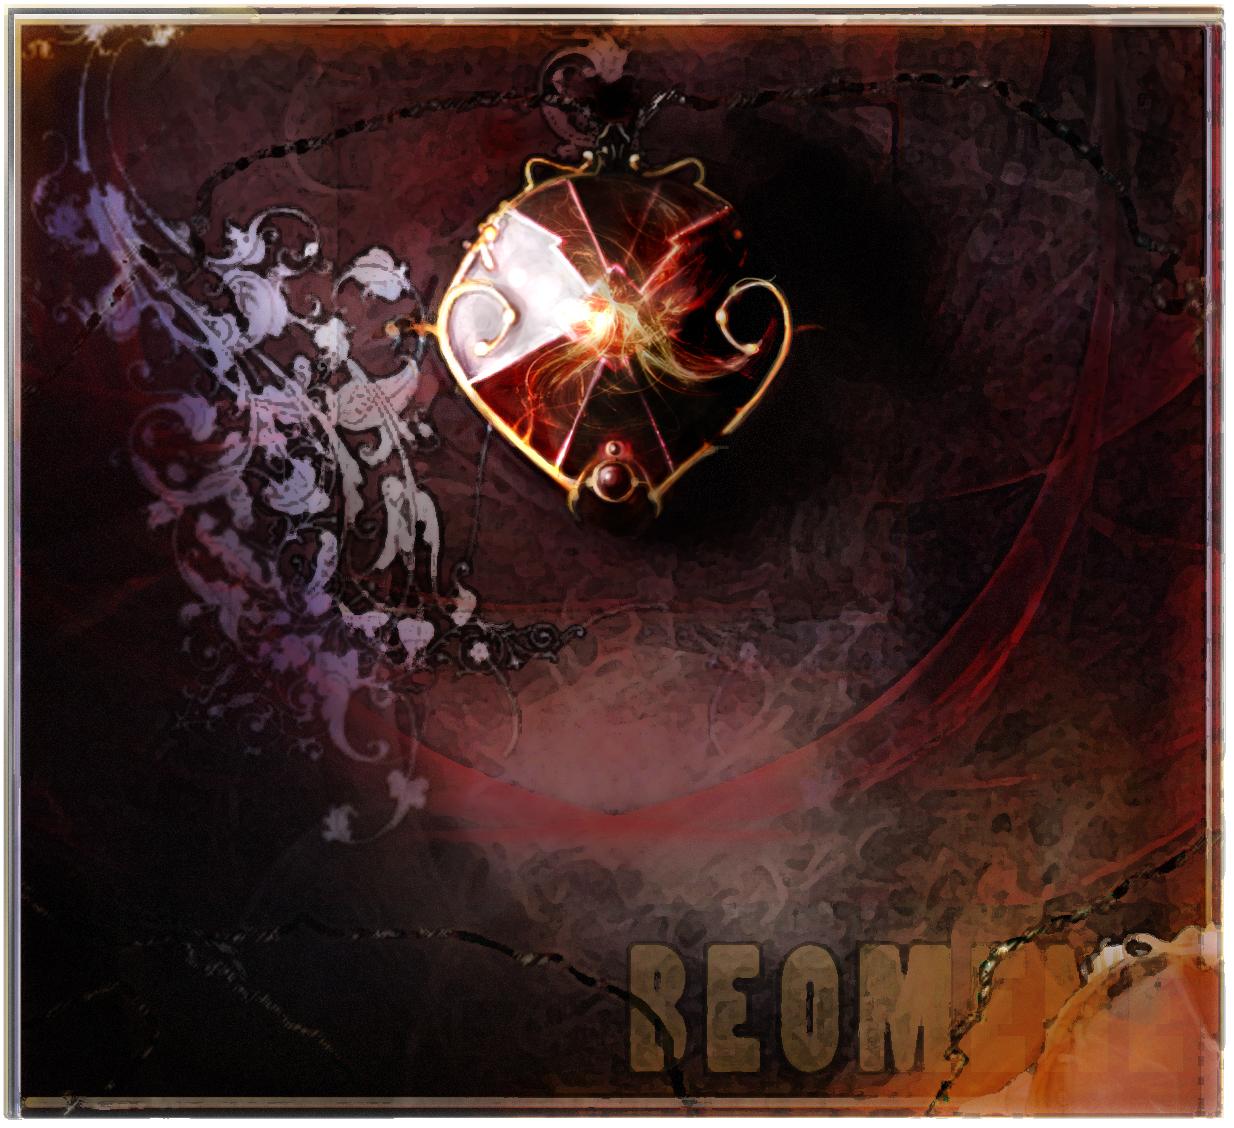 Su'fal by Beomene